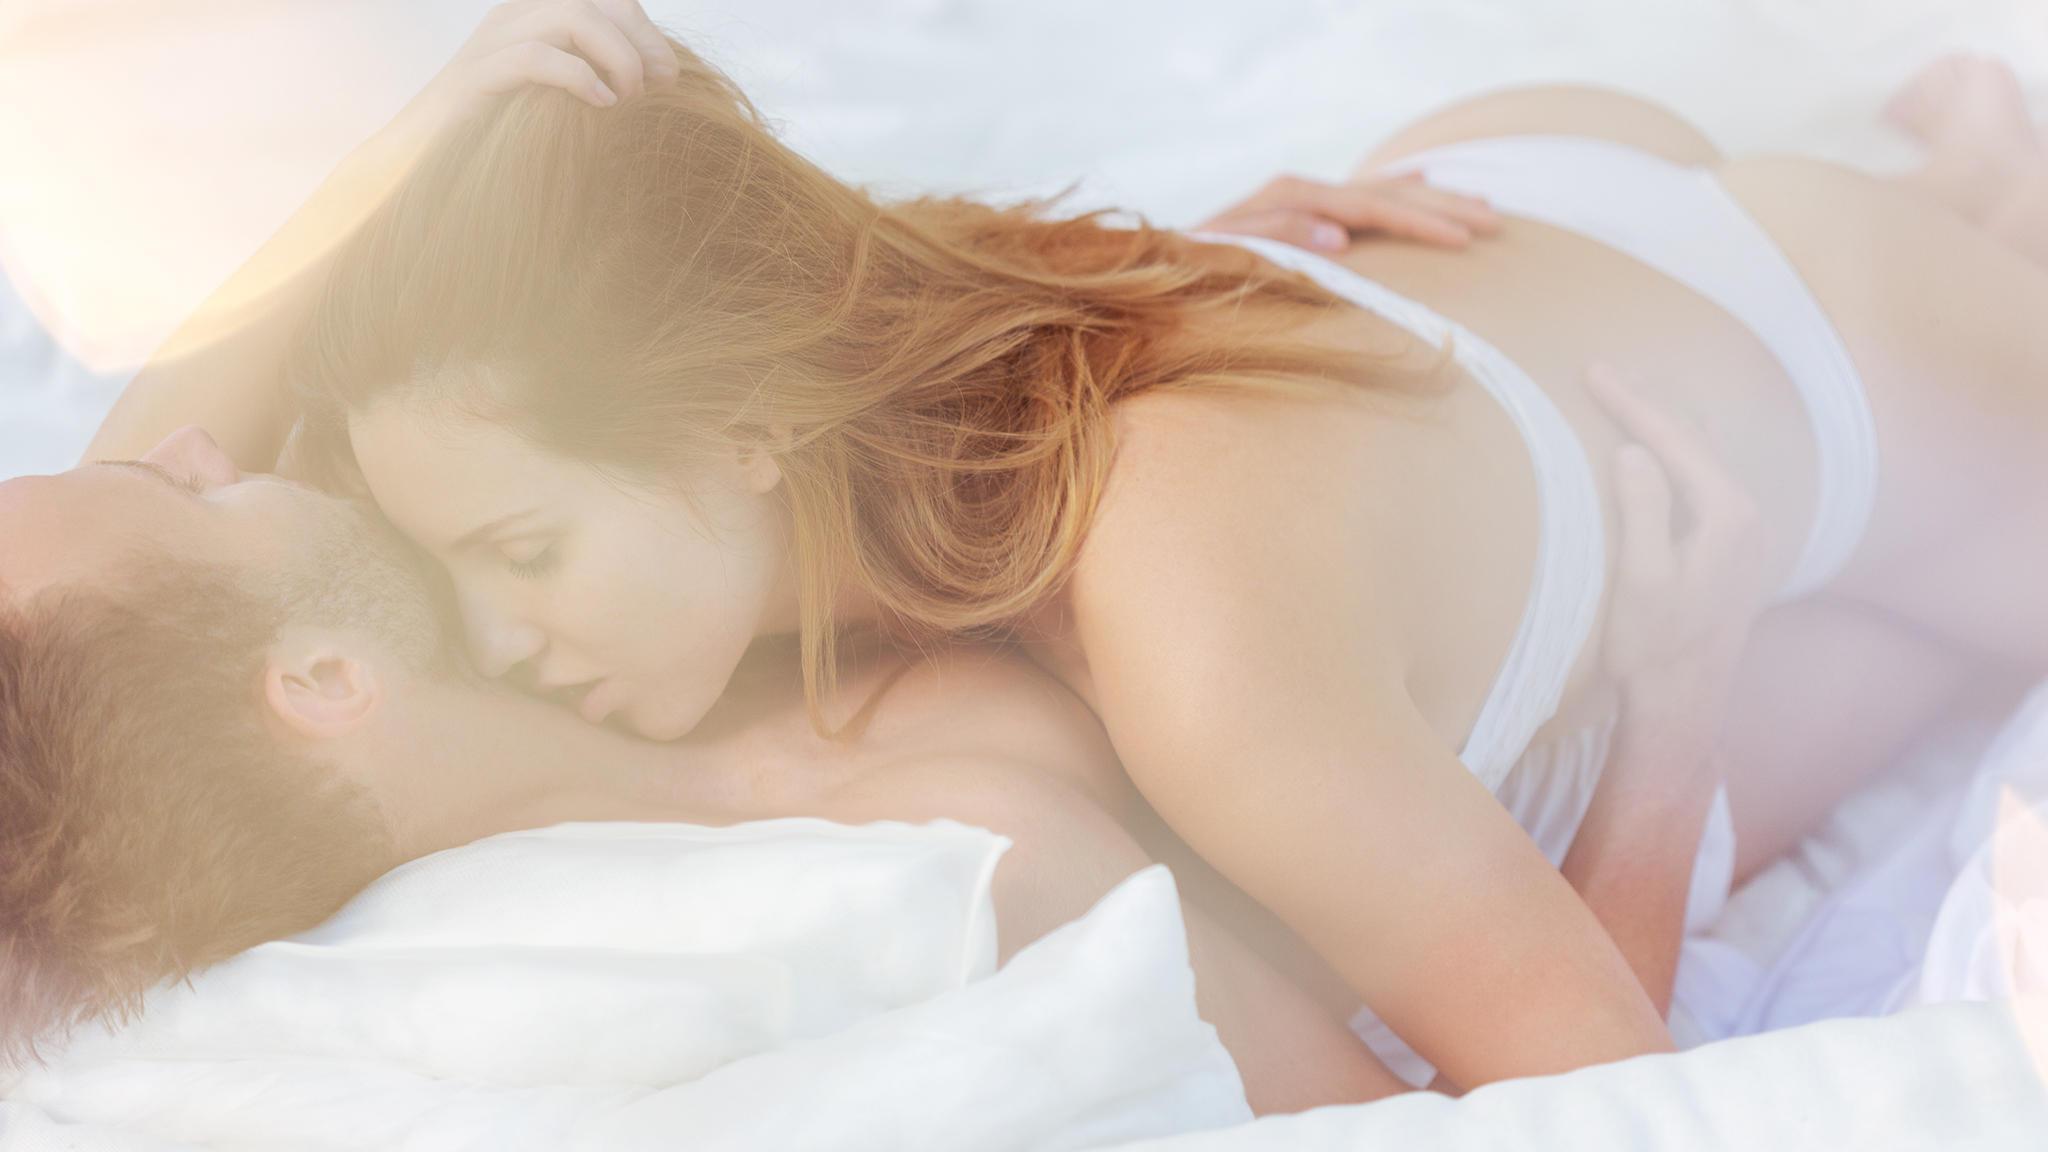 Gerade-Freund schwule Pornos